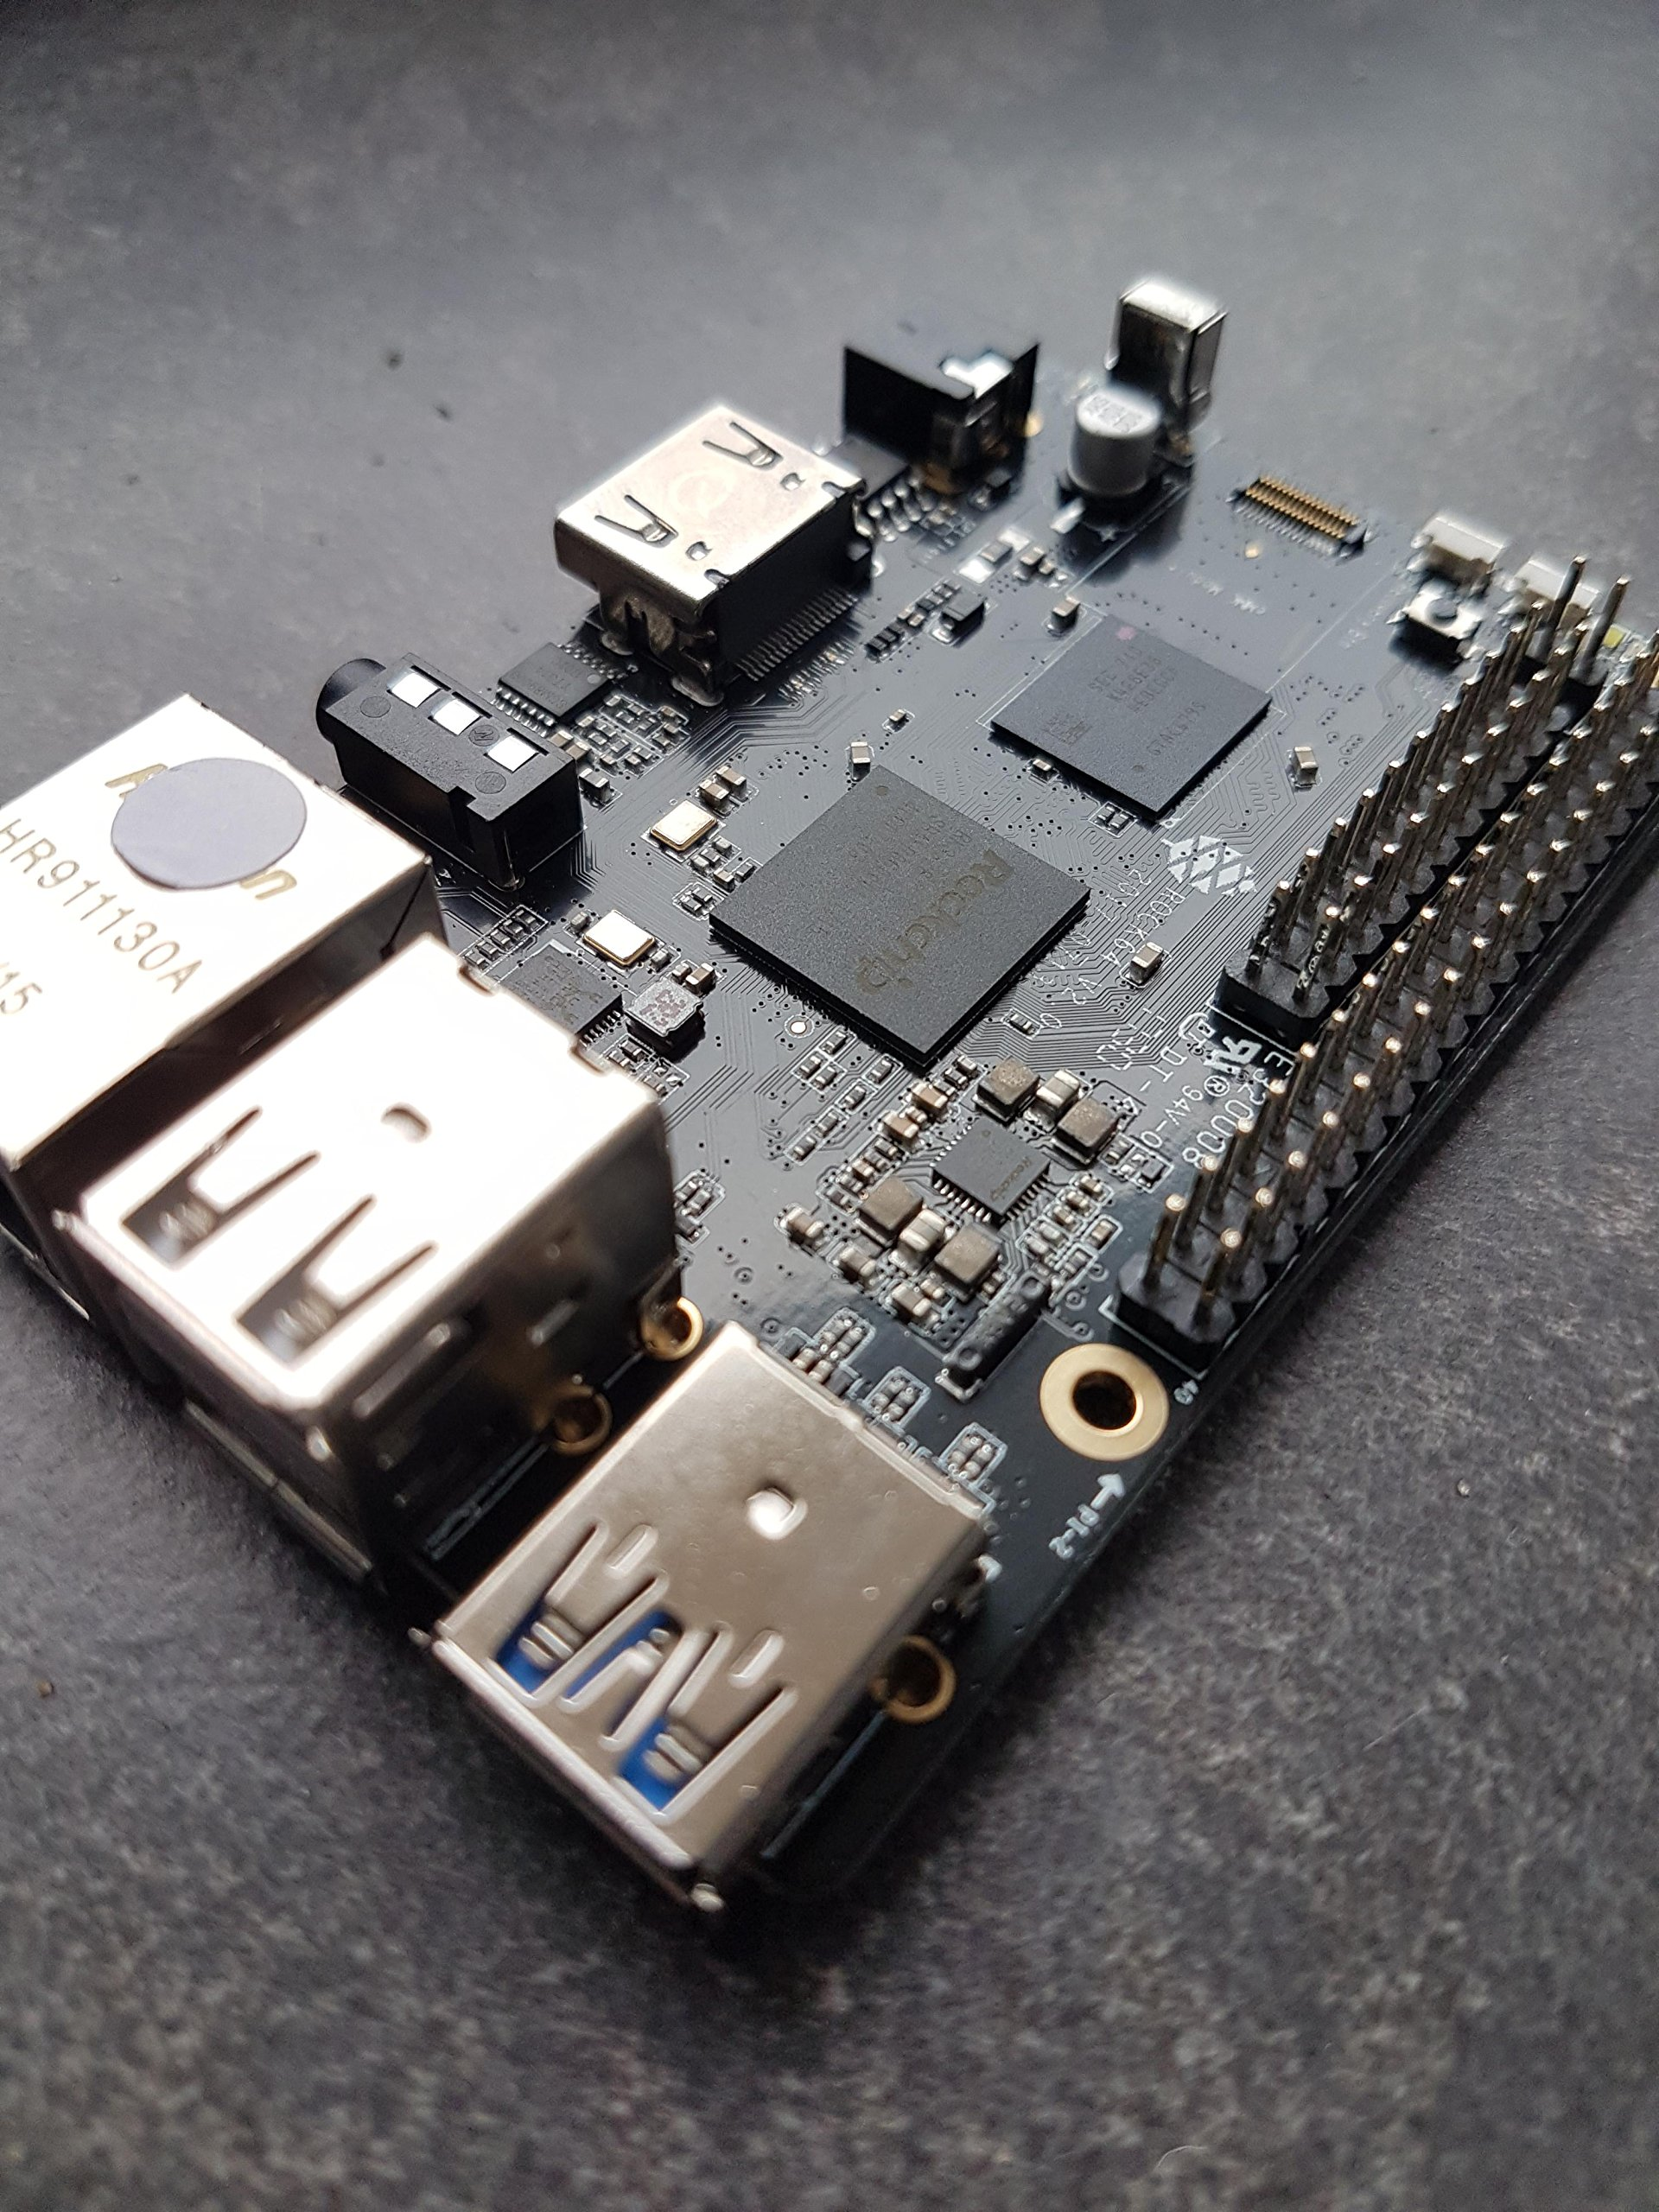 ROCK64 4GB single-board computer - R64-BOARD-4GB < Categories